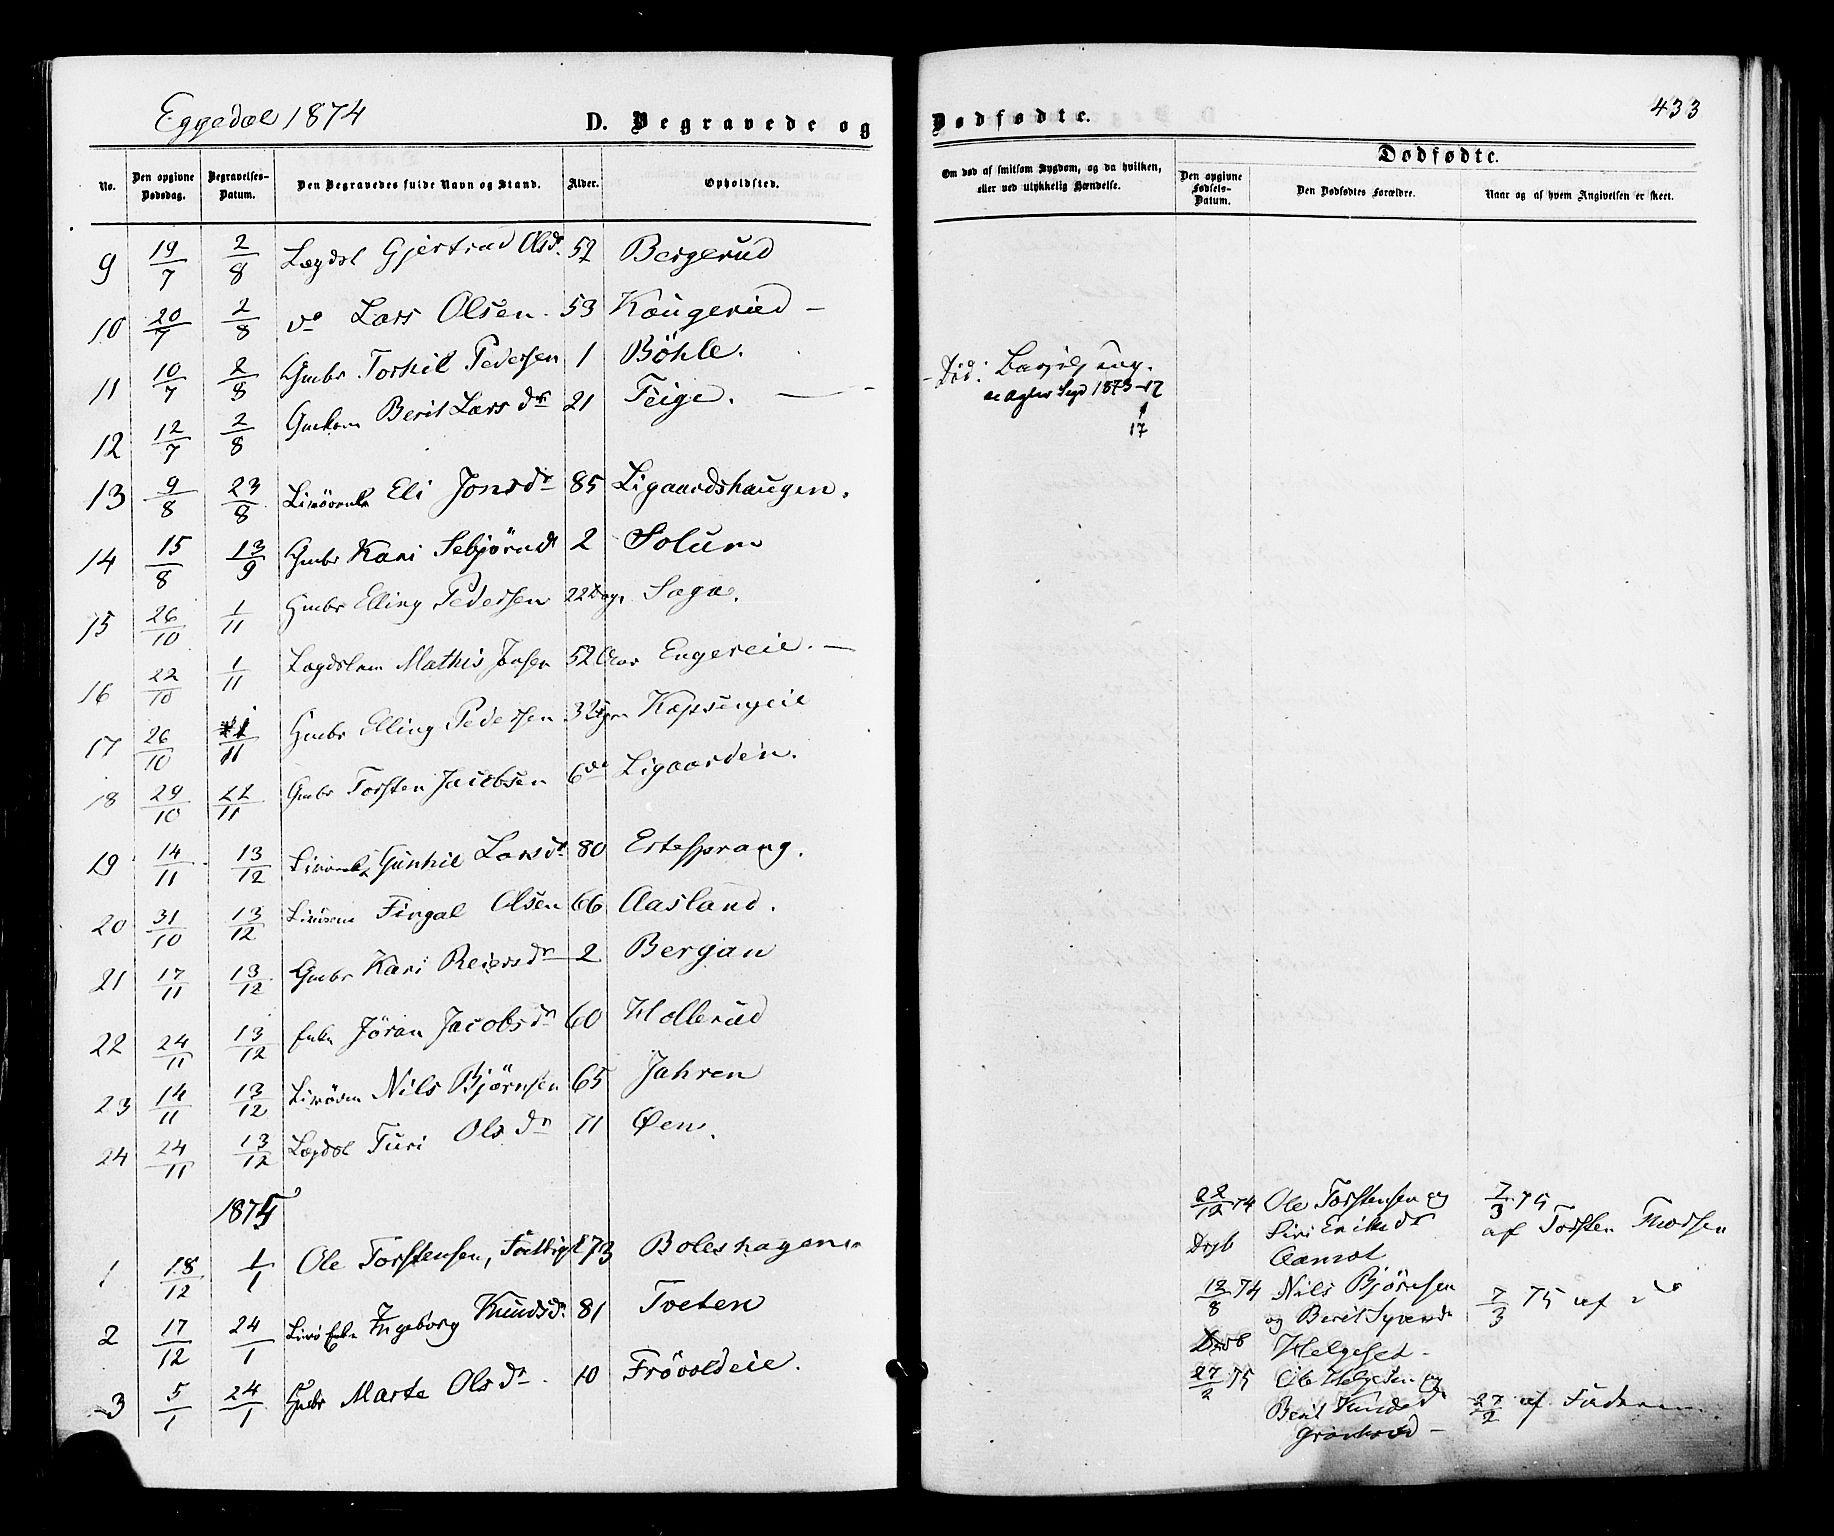 SAKO, Sigdal kirkebøker, F/Fa/L0010: Parish register (official) no. I 10 /3, 1872-1878, p. 433